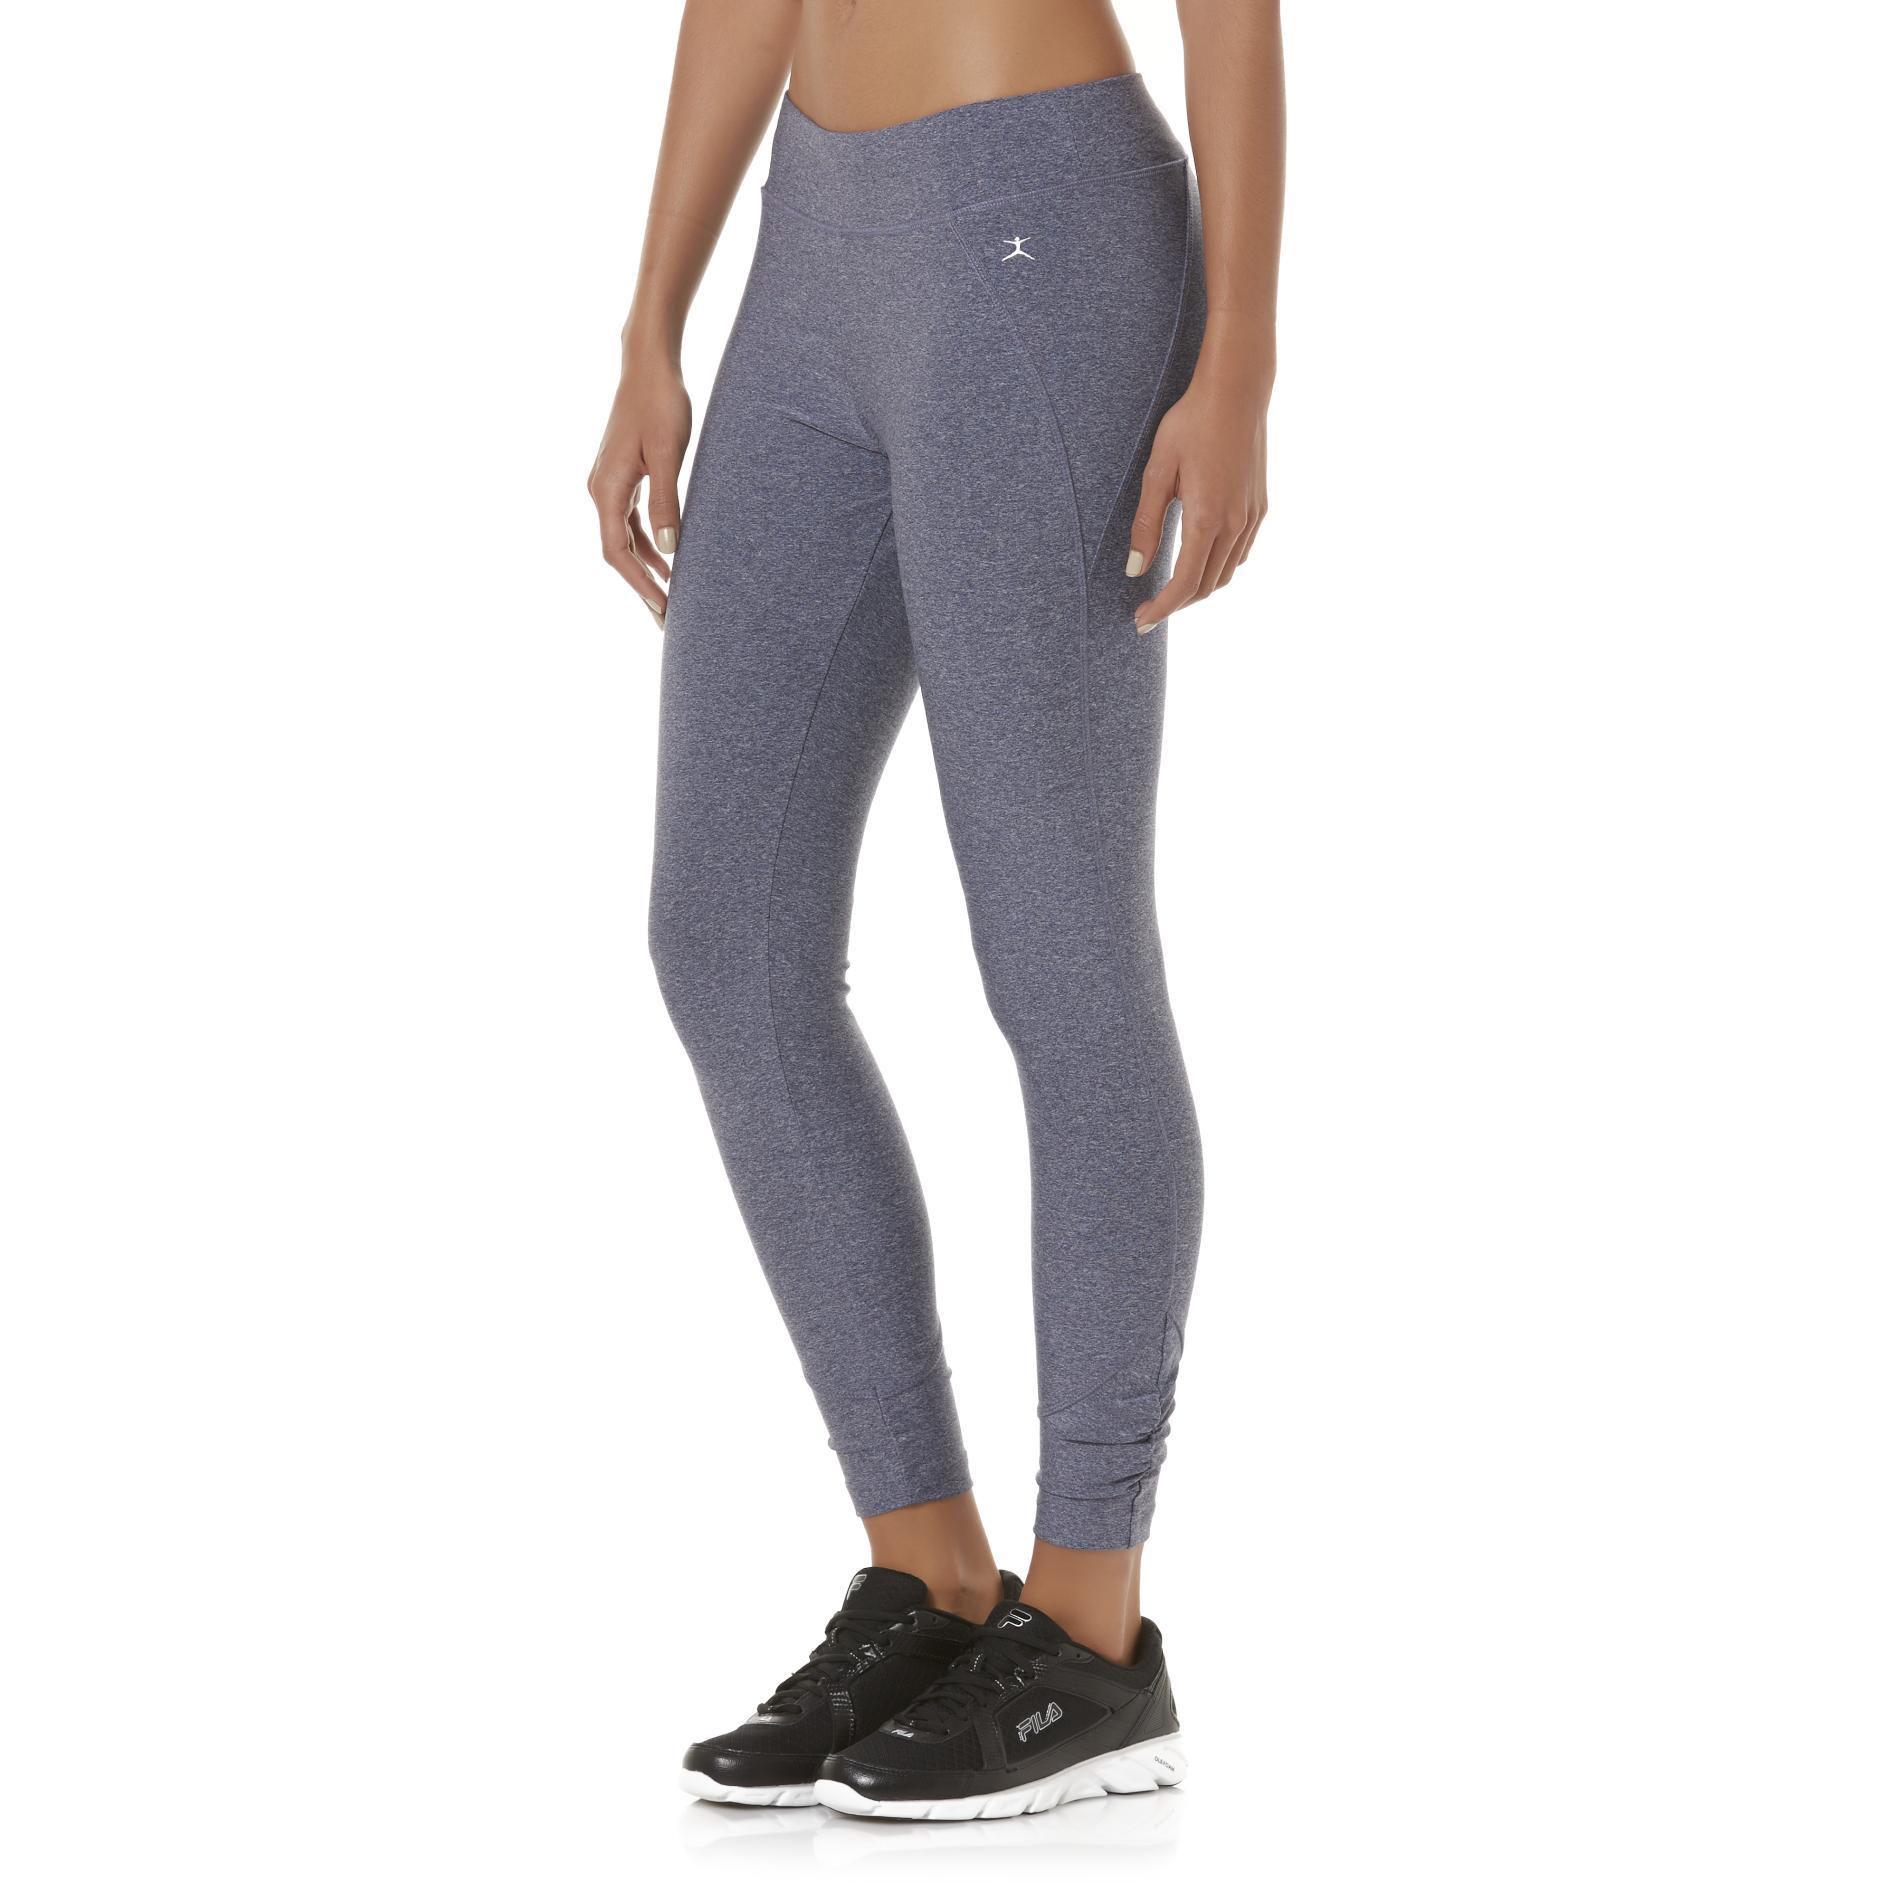 danskin womenu0027s spring fling cropped athletic leggings NQXJHFM